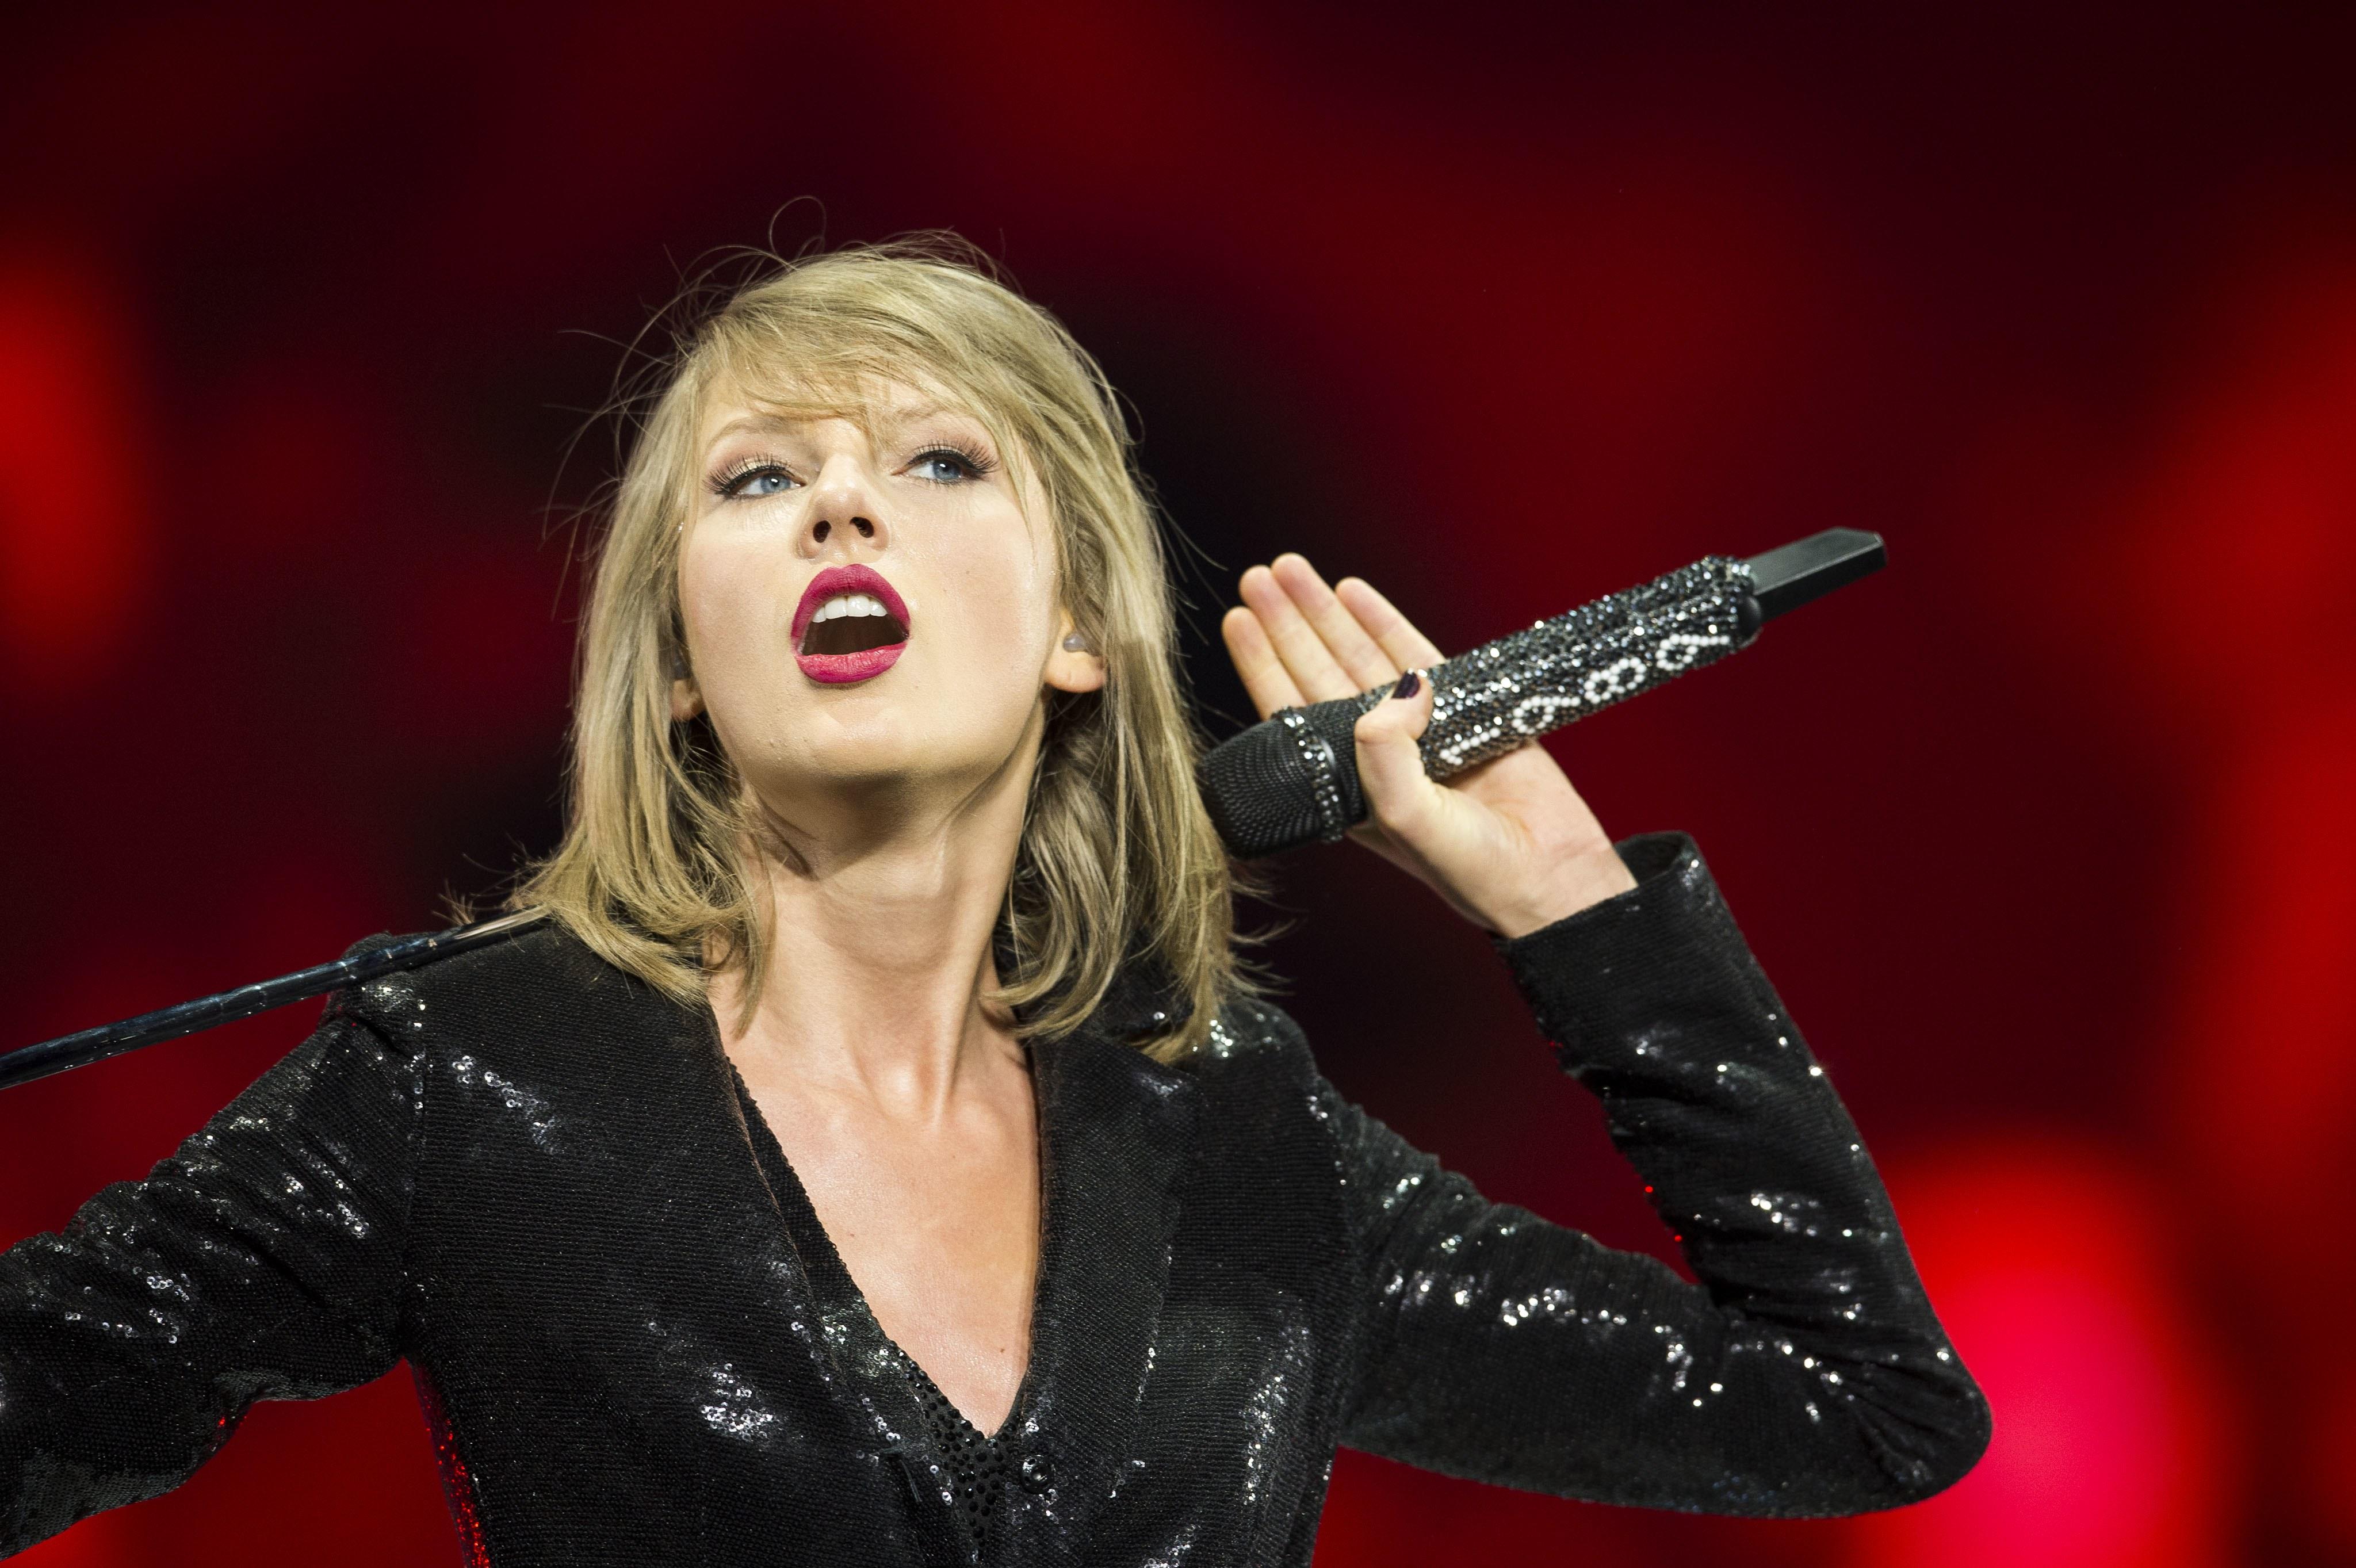 Taylor Swift 4k Ultra Hd Wallpaper Background Image 4096x2726